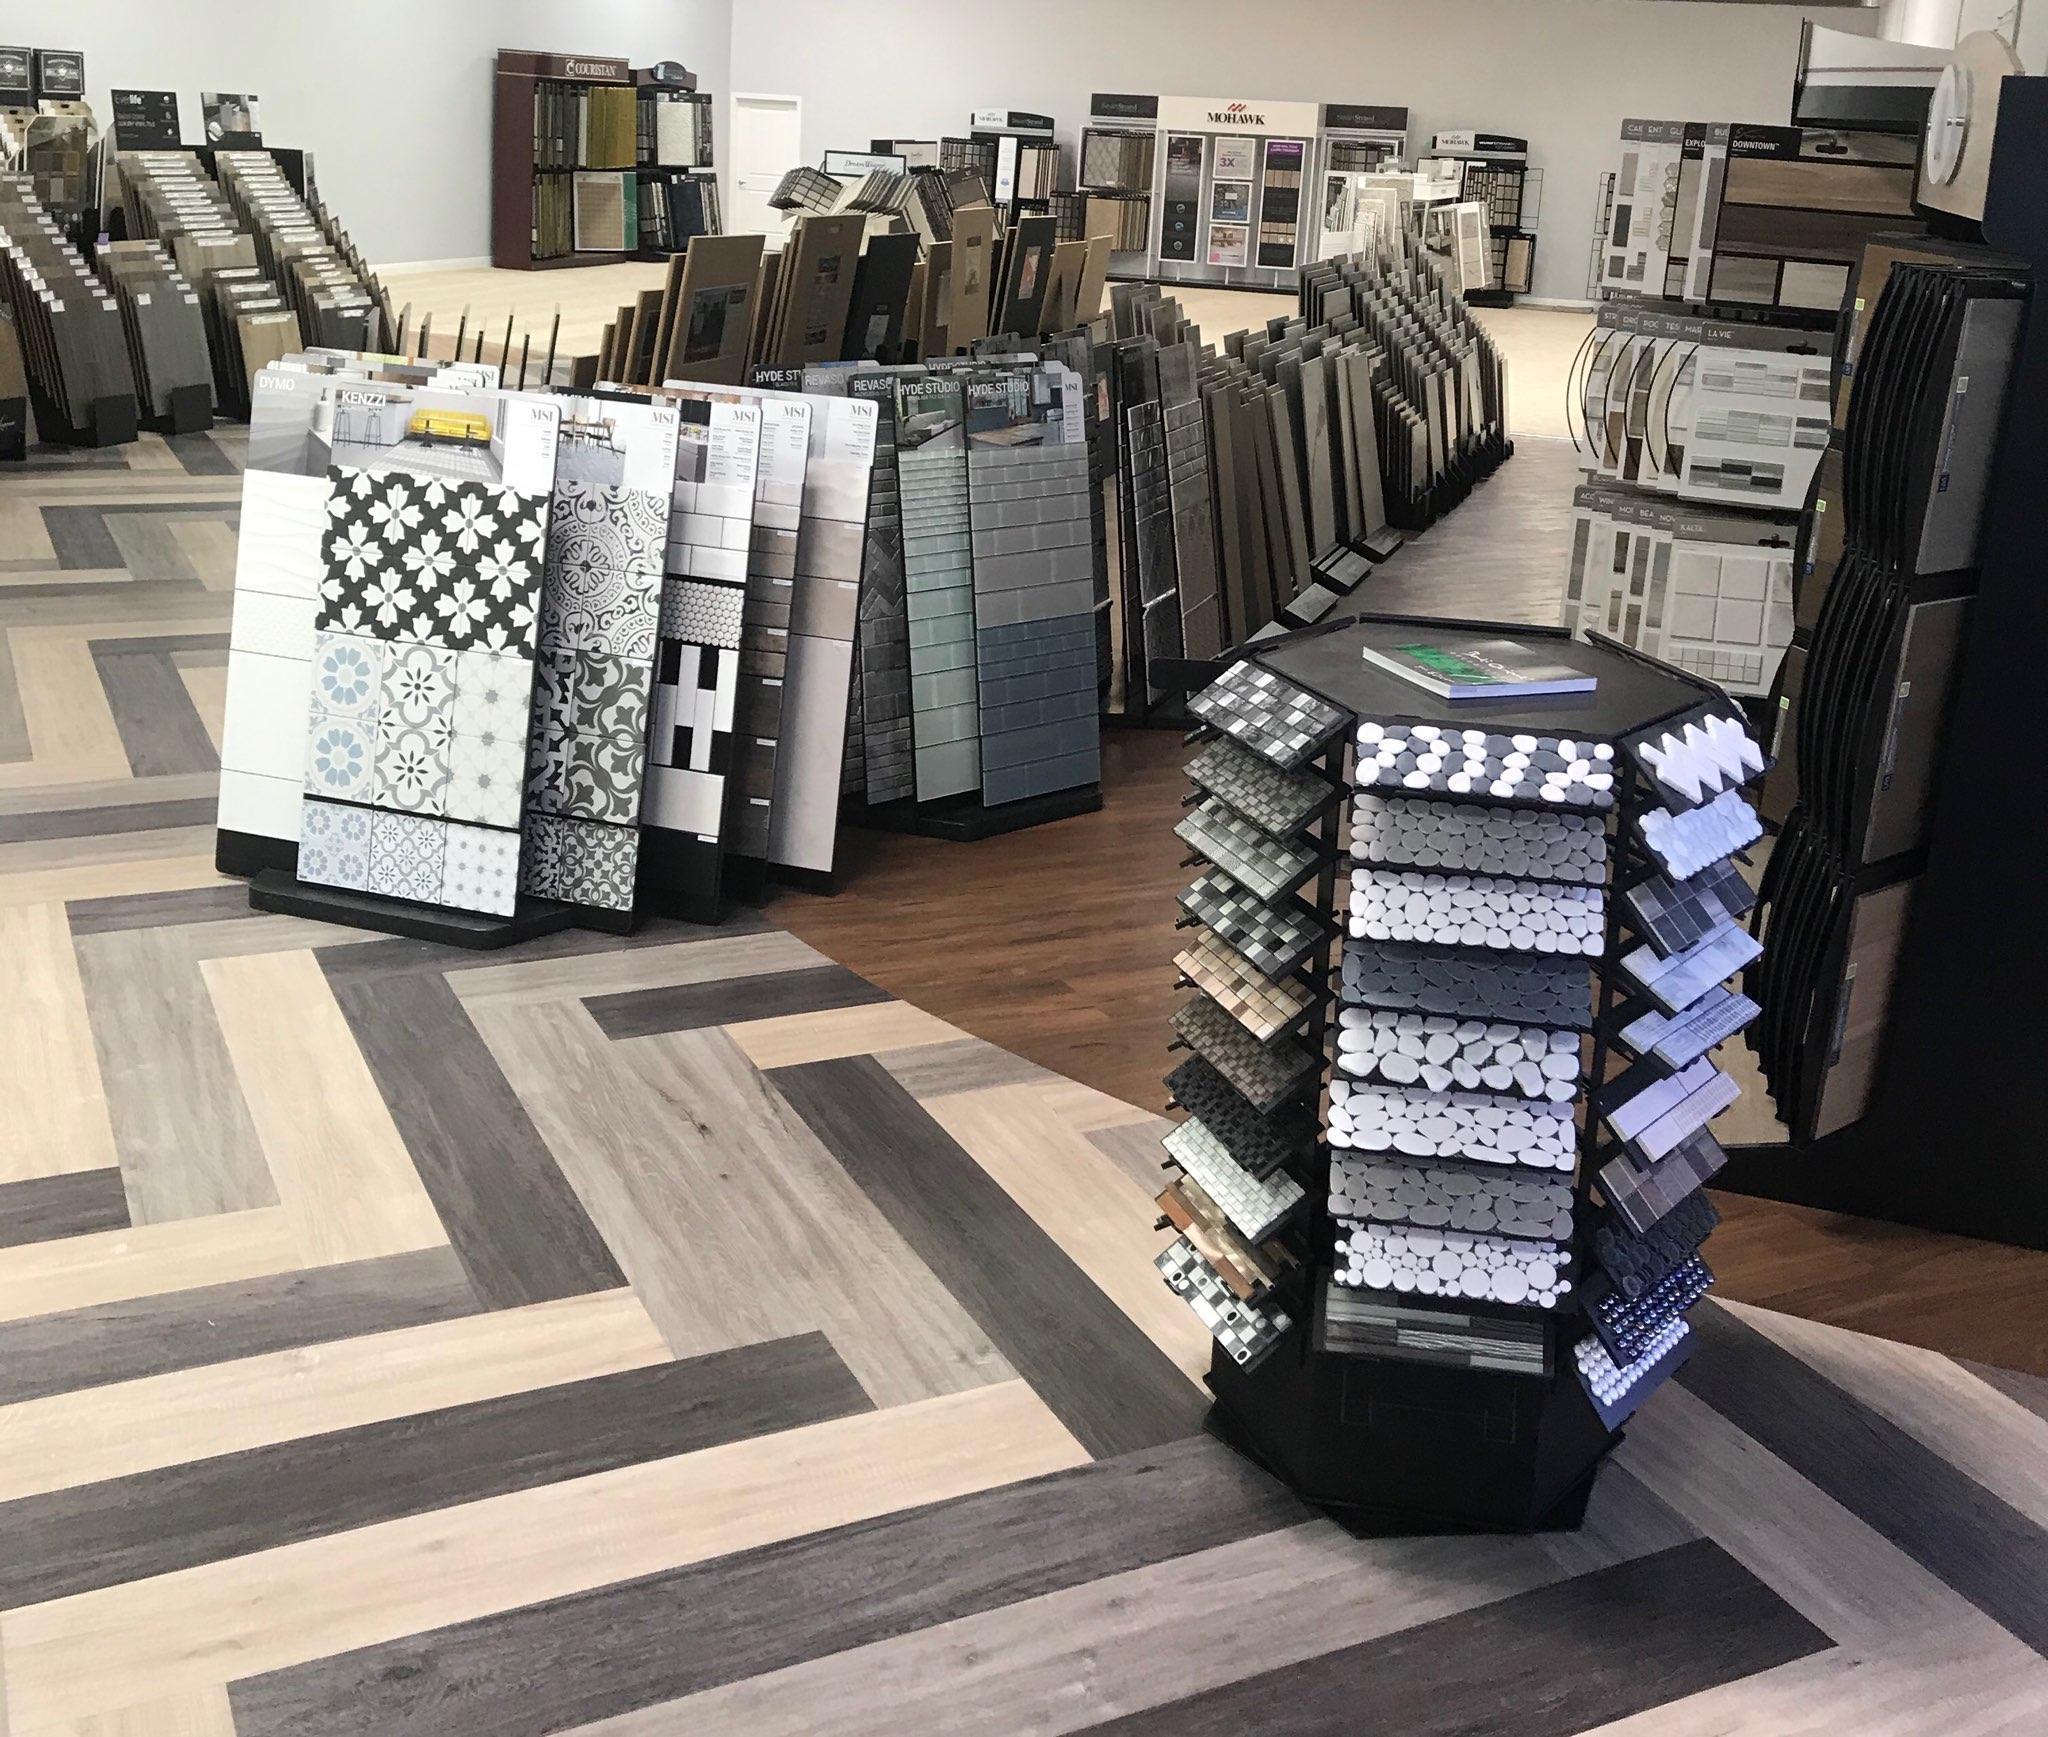 Red Rock Flooring & Design - 270 S M.L.K. Blvd, Las Vegas, NV 89106